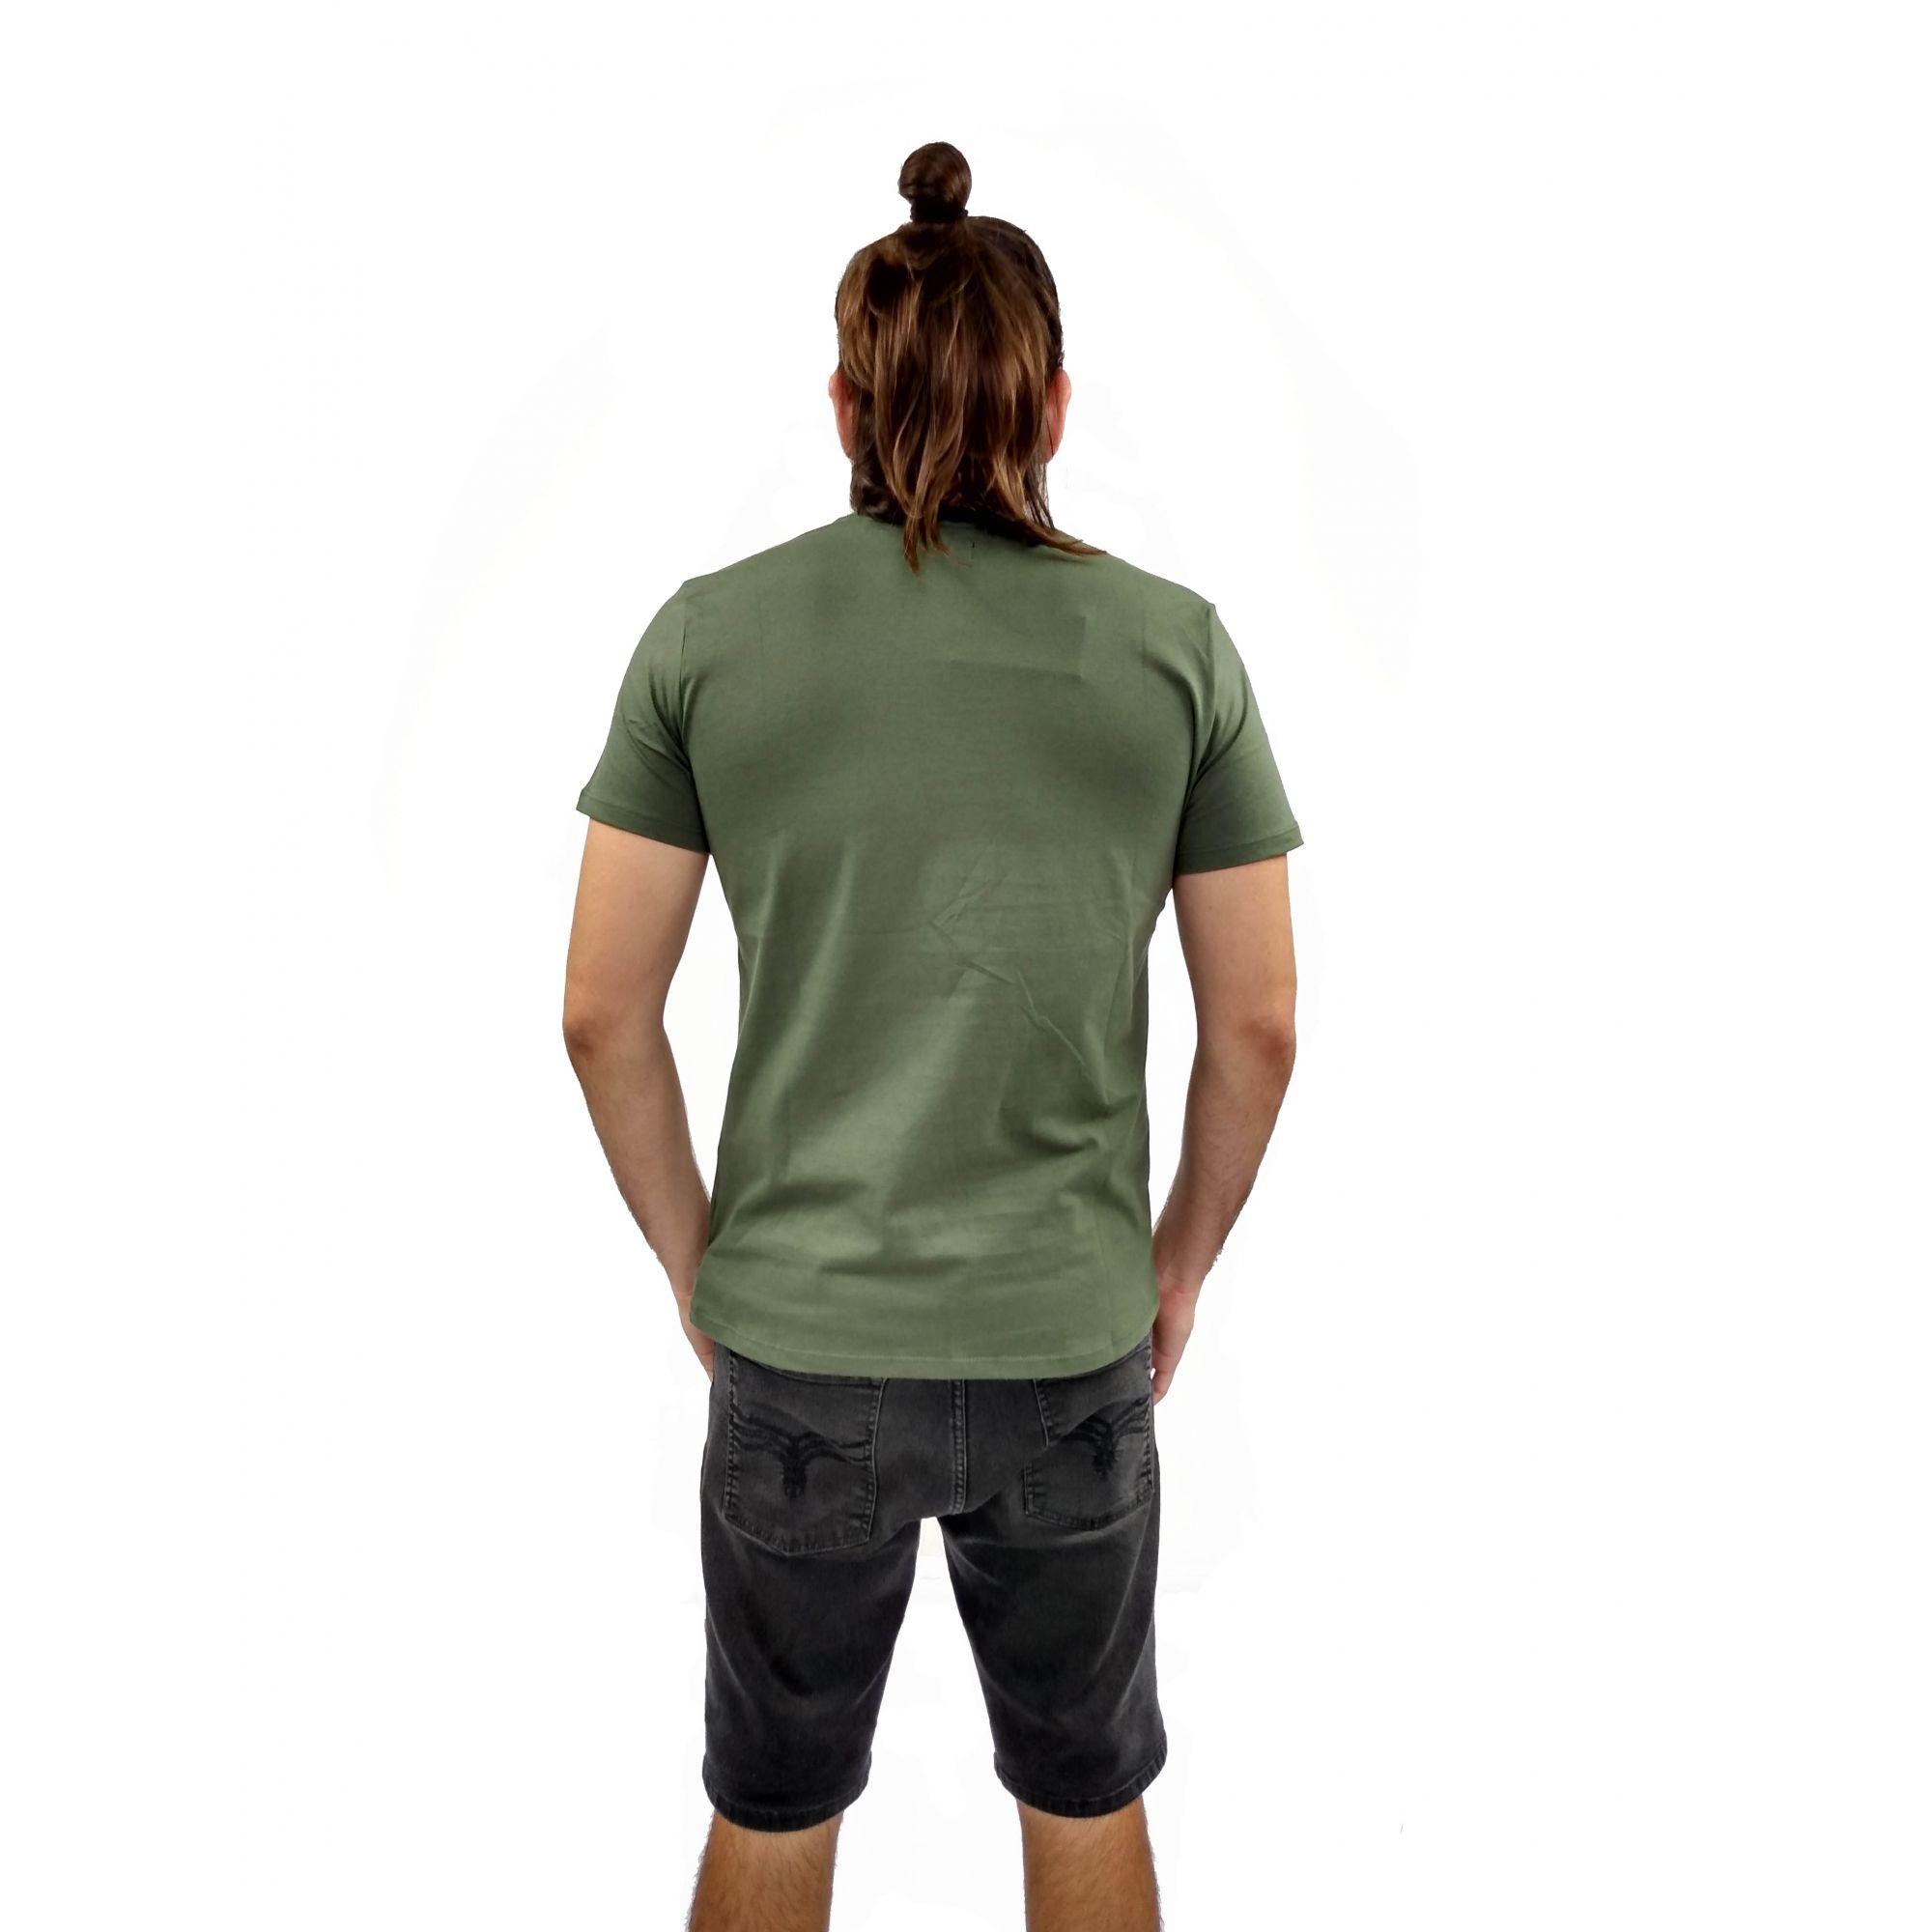 Camiseta Acostamento Masculina Manga Curta